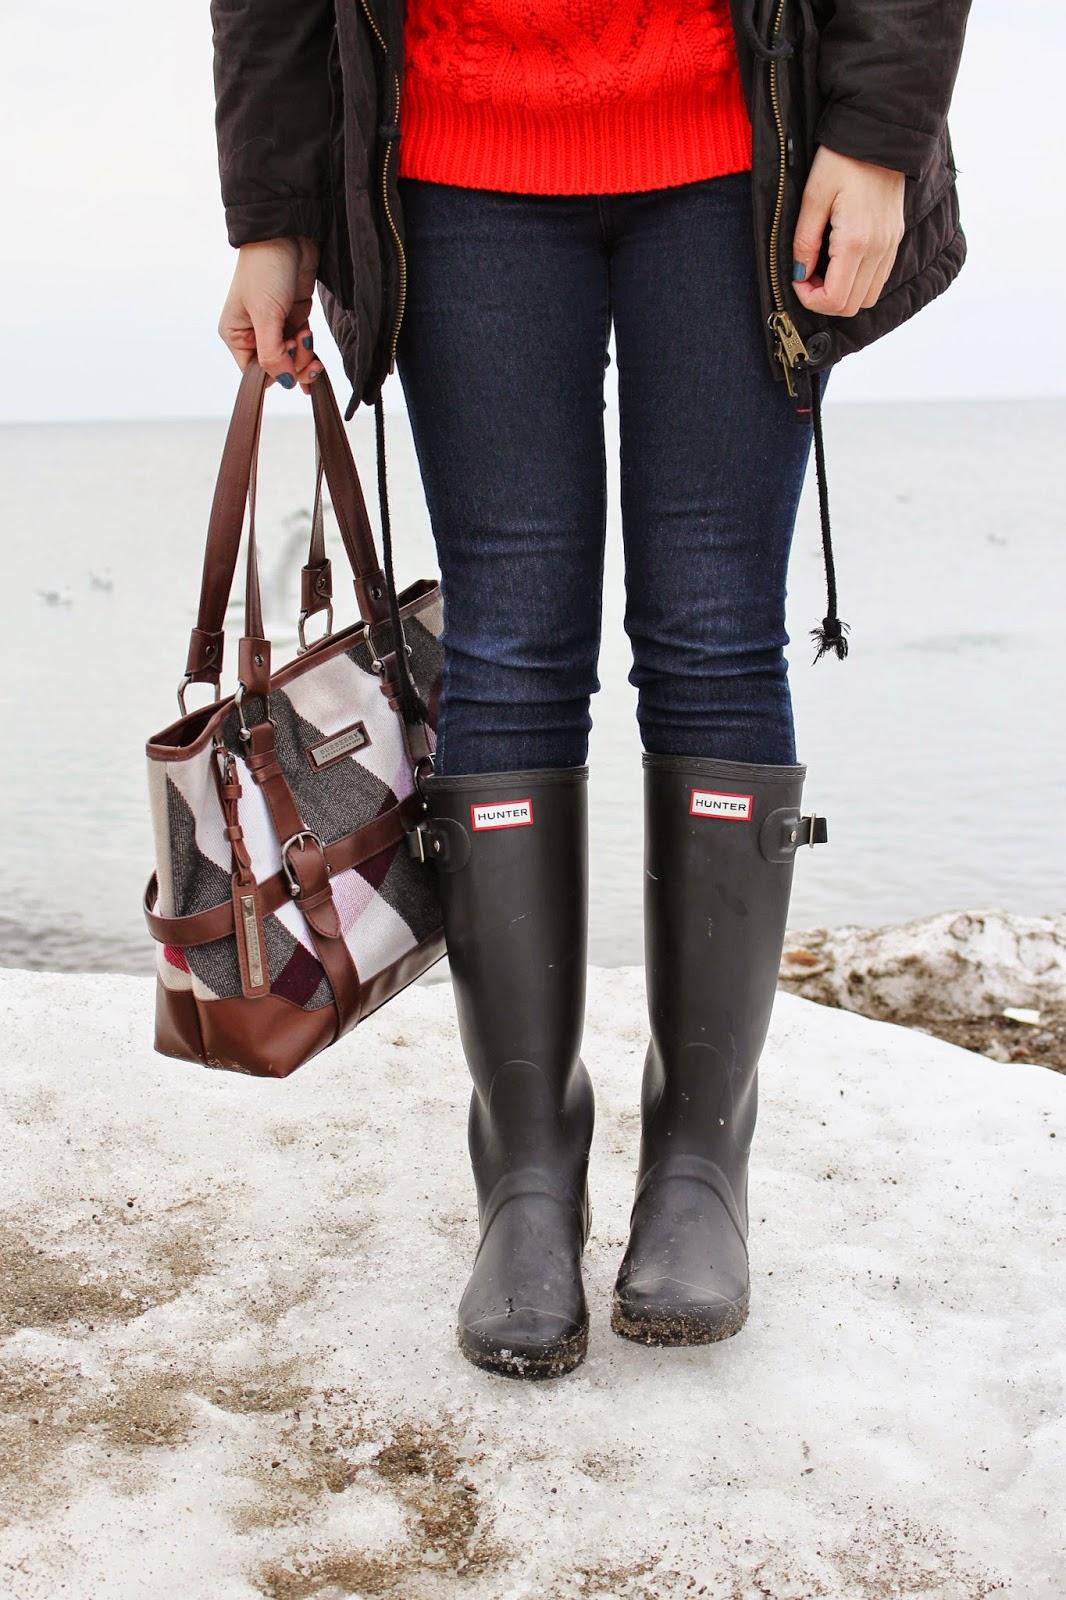 bijuleni - Hunter boots and Burberry purse